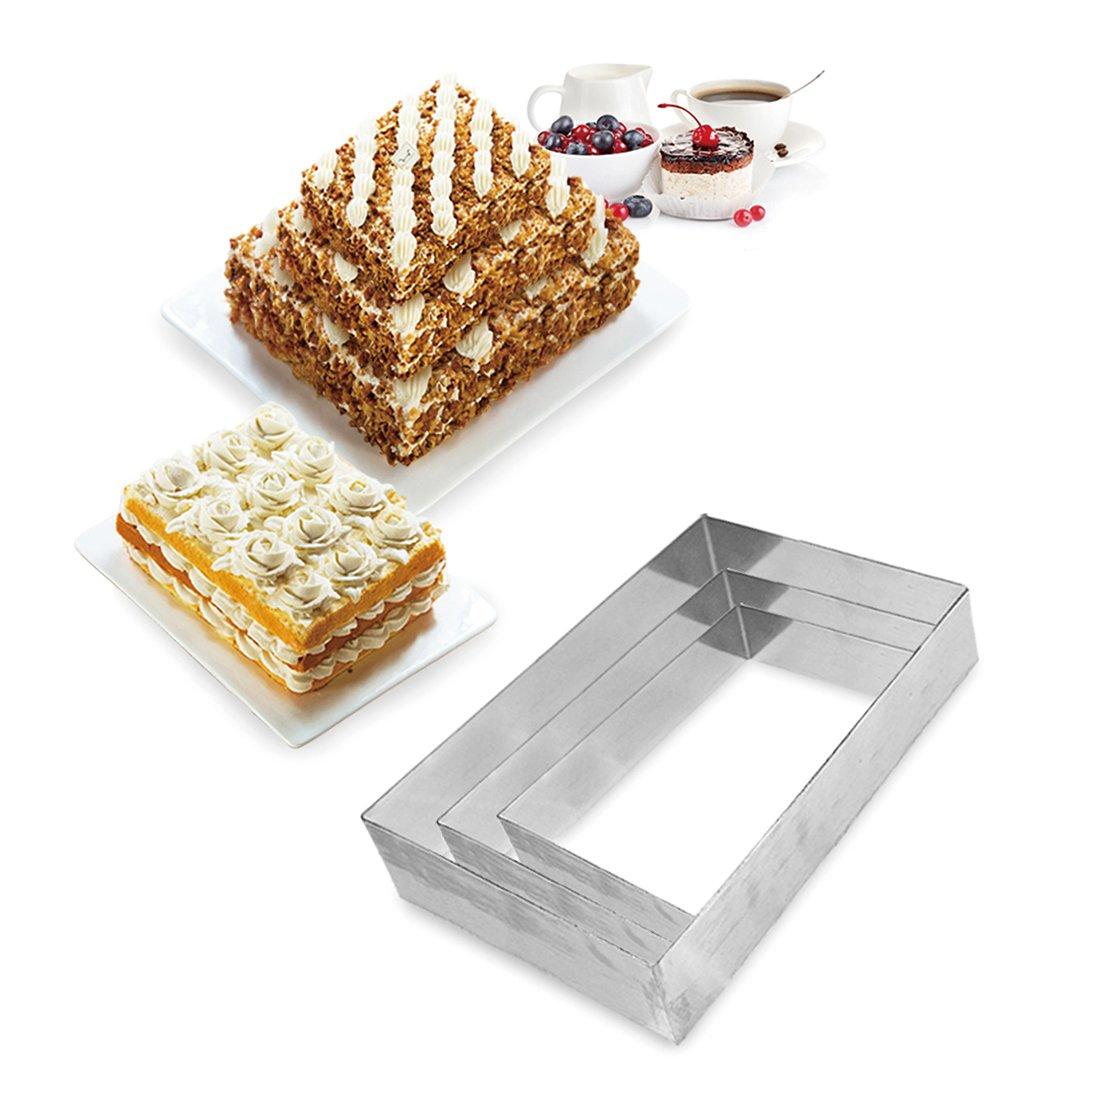 FunWhale 3 Tier Rectangular Multilayer Anniversary Birthday Cake Baking Pans,Stainless Steel 3 Sizes Rings Rectangular Molding Mousse Cake Rings(Rectangular-shape,Set of 3)